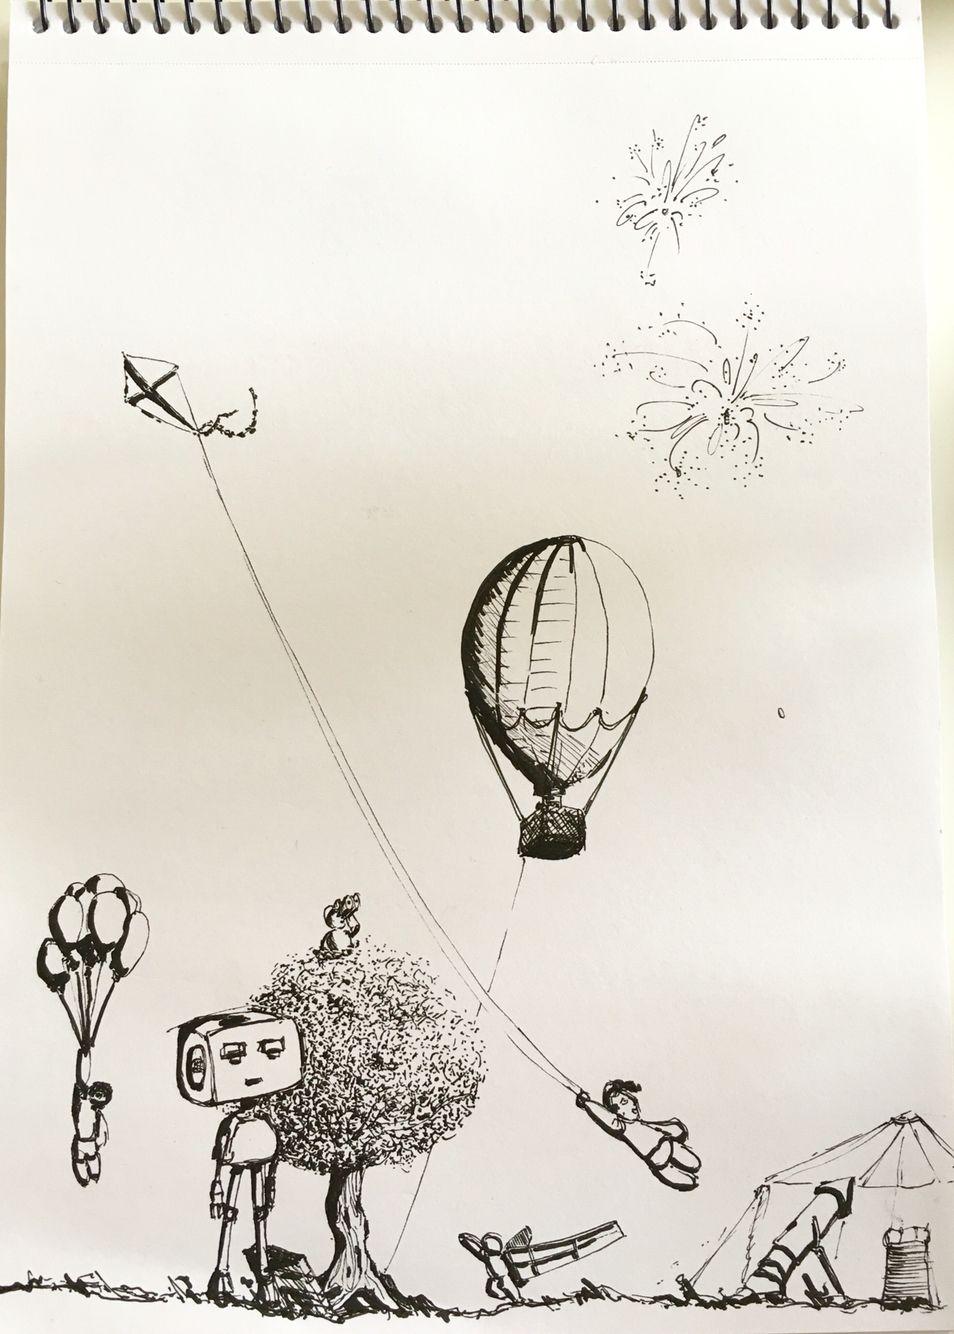 transparent Gesture black kids sketches. Imagination drawing pen and ink